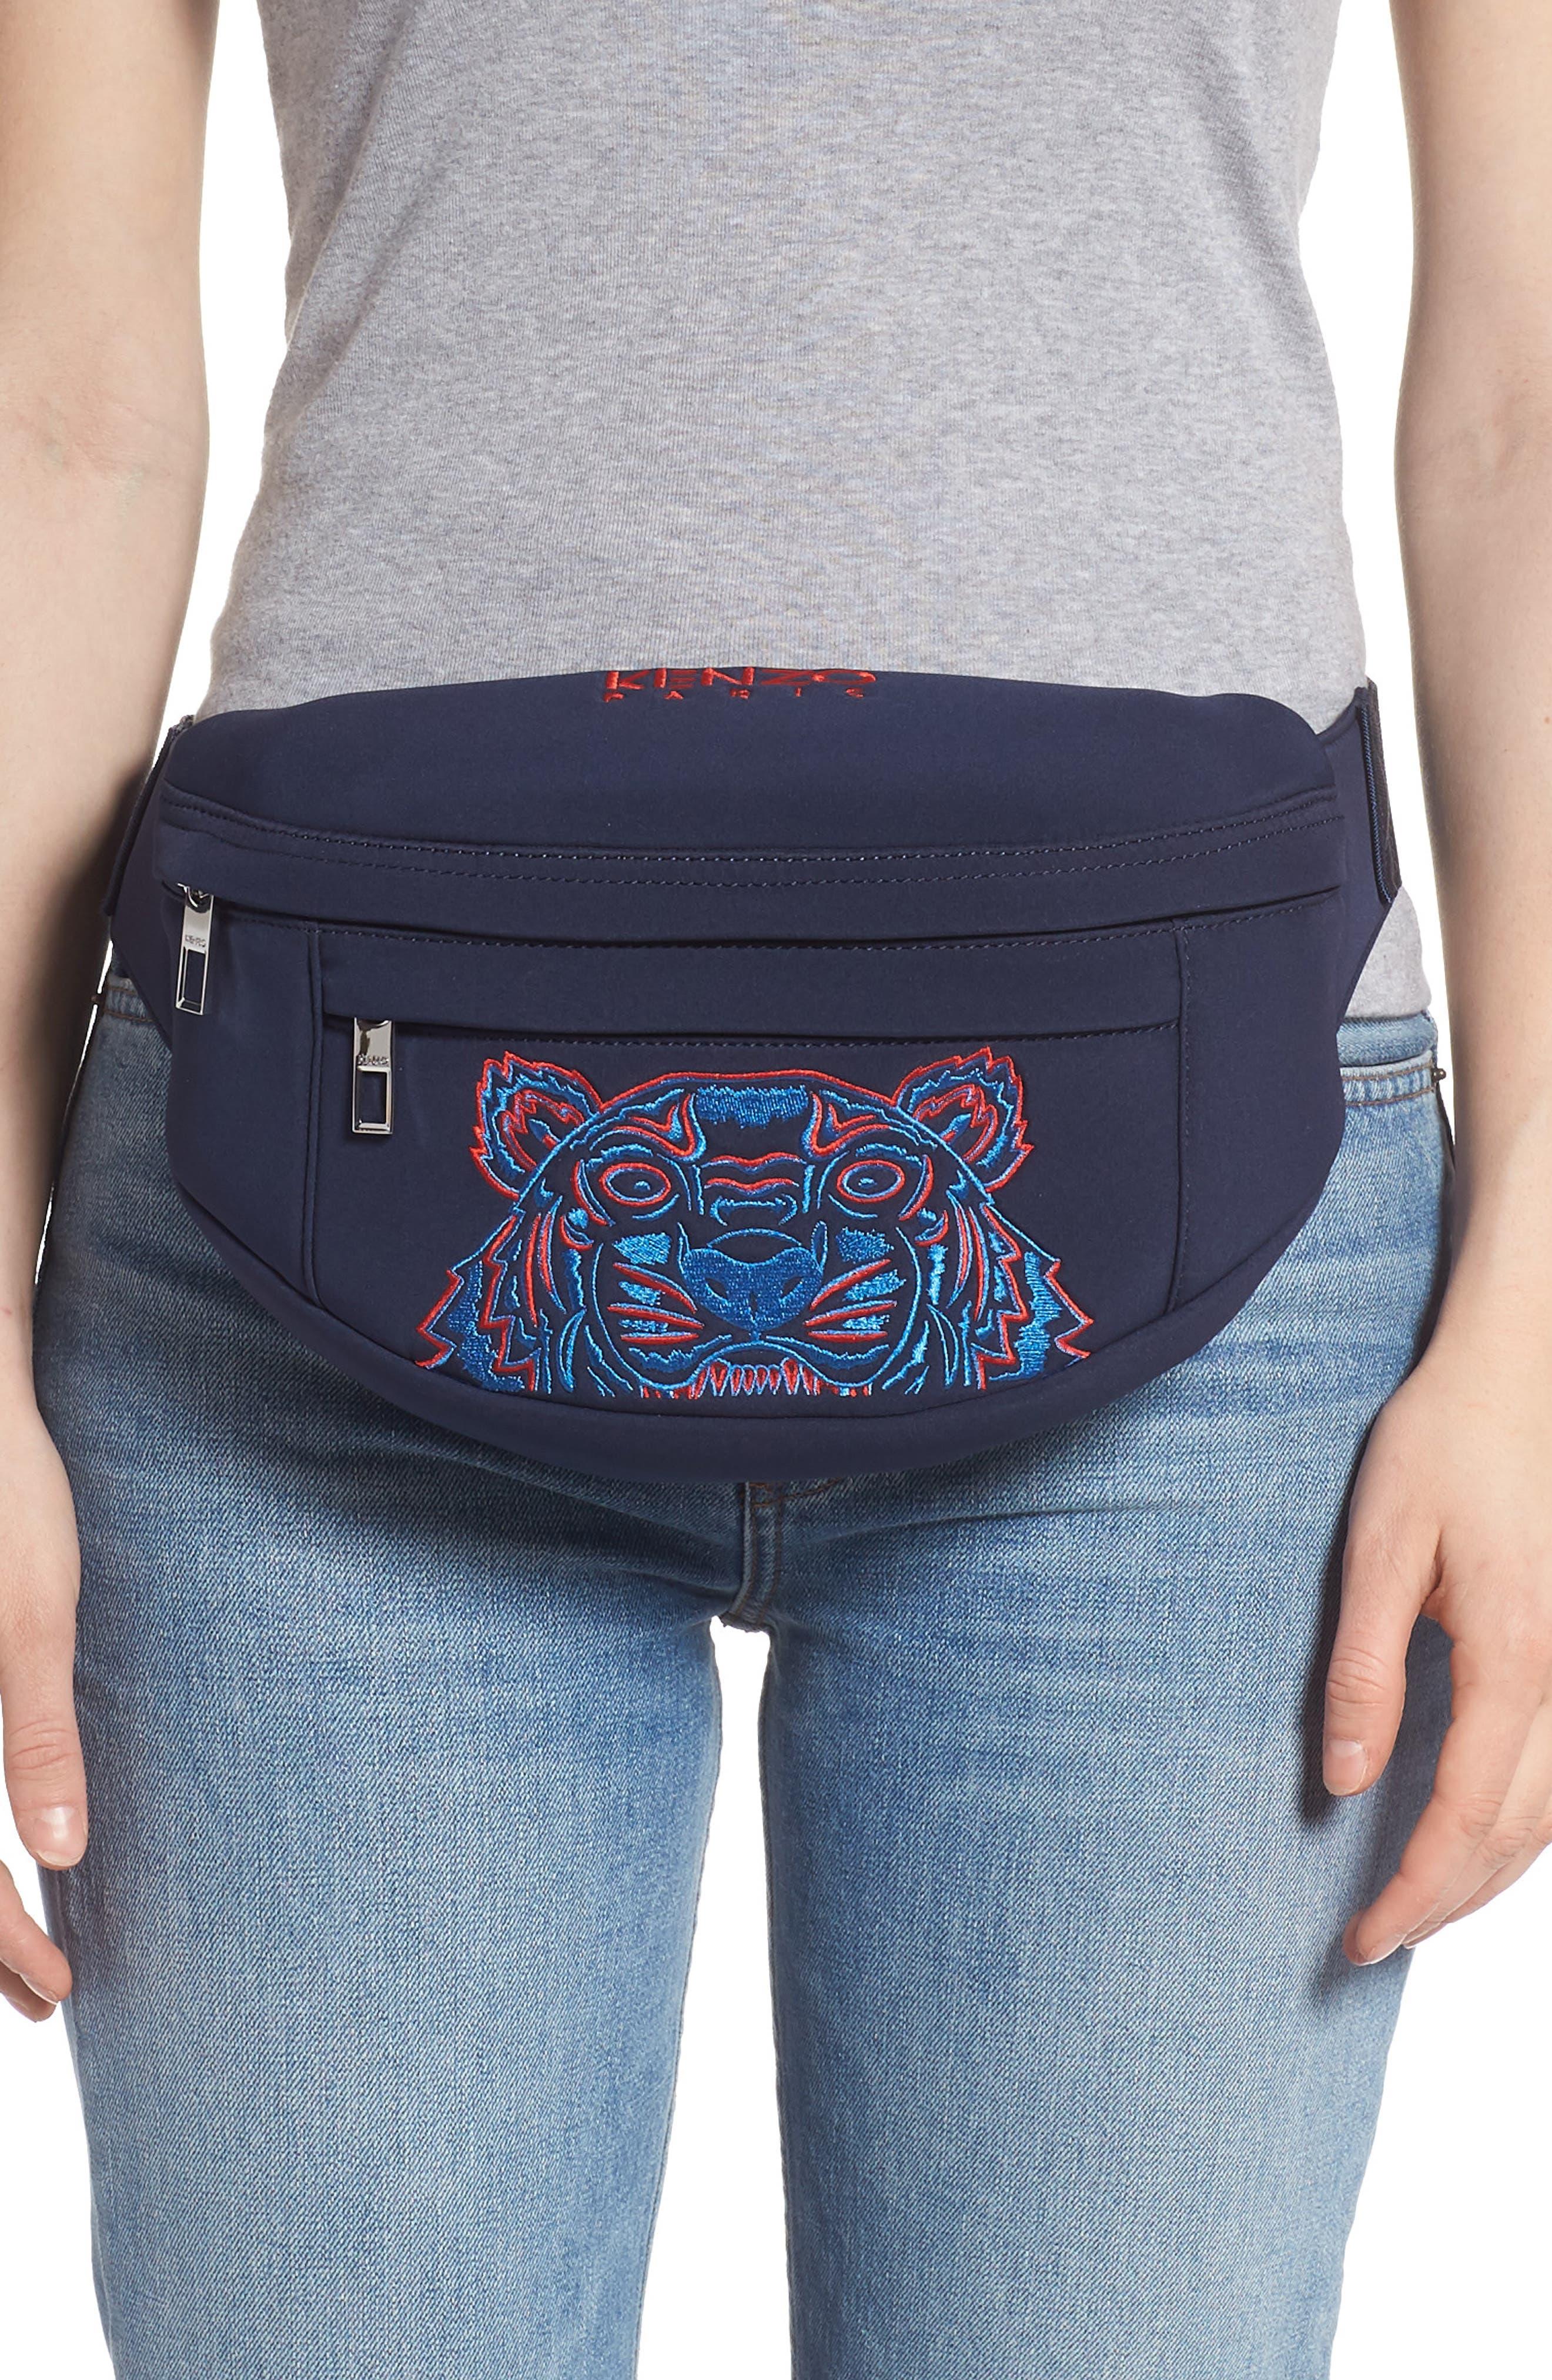 KENZO, Embroidered Tiger Belt Bag, Alternate thumbnail 2, color, 76A NAVY BLUE